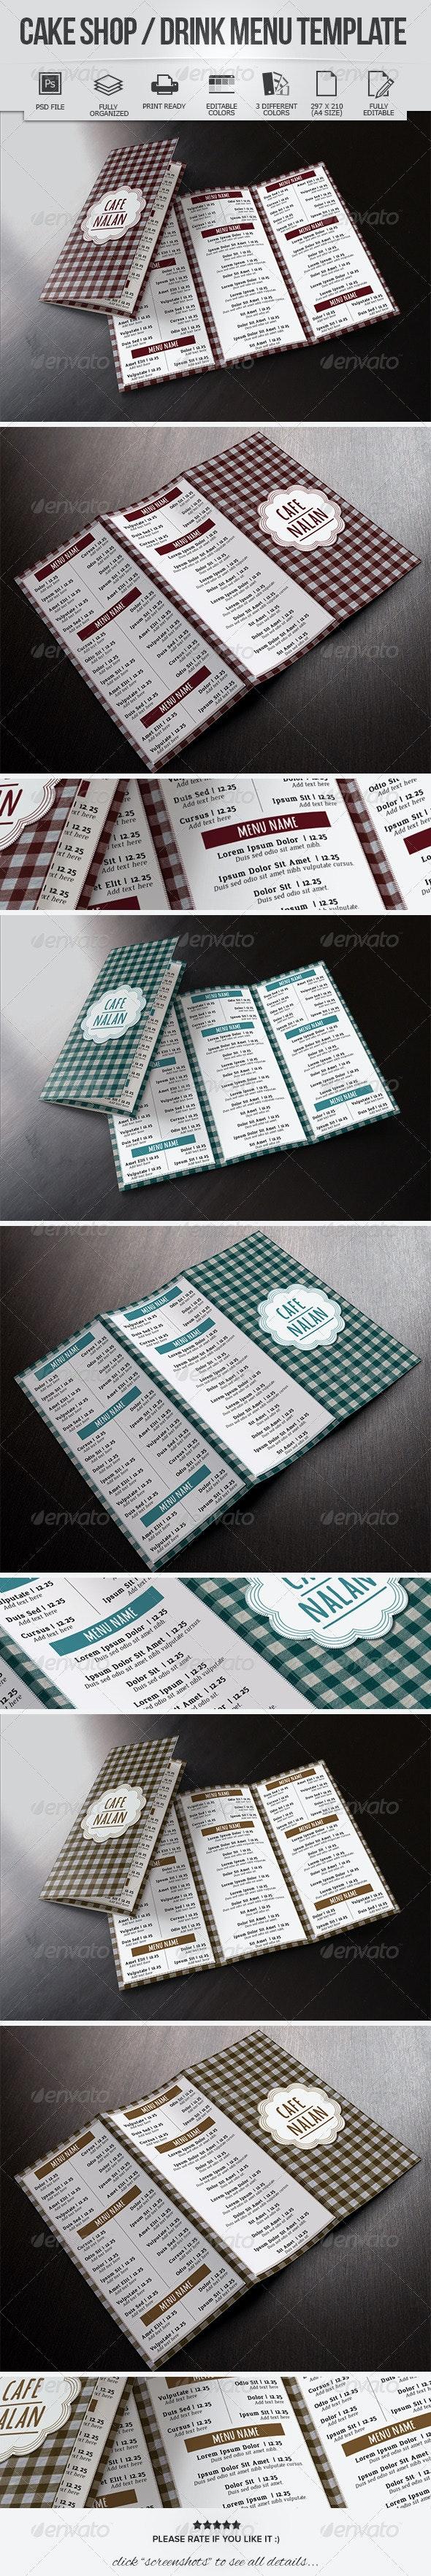 Cake Shop / Drink Menu Template - Food Menus Print Templates